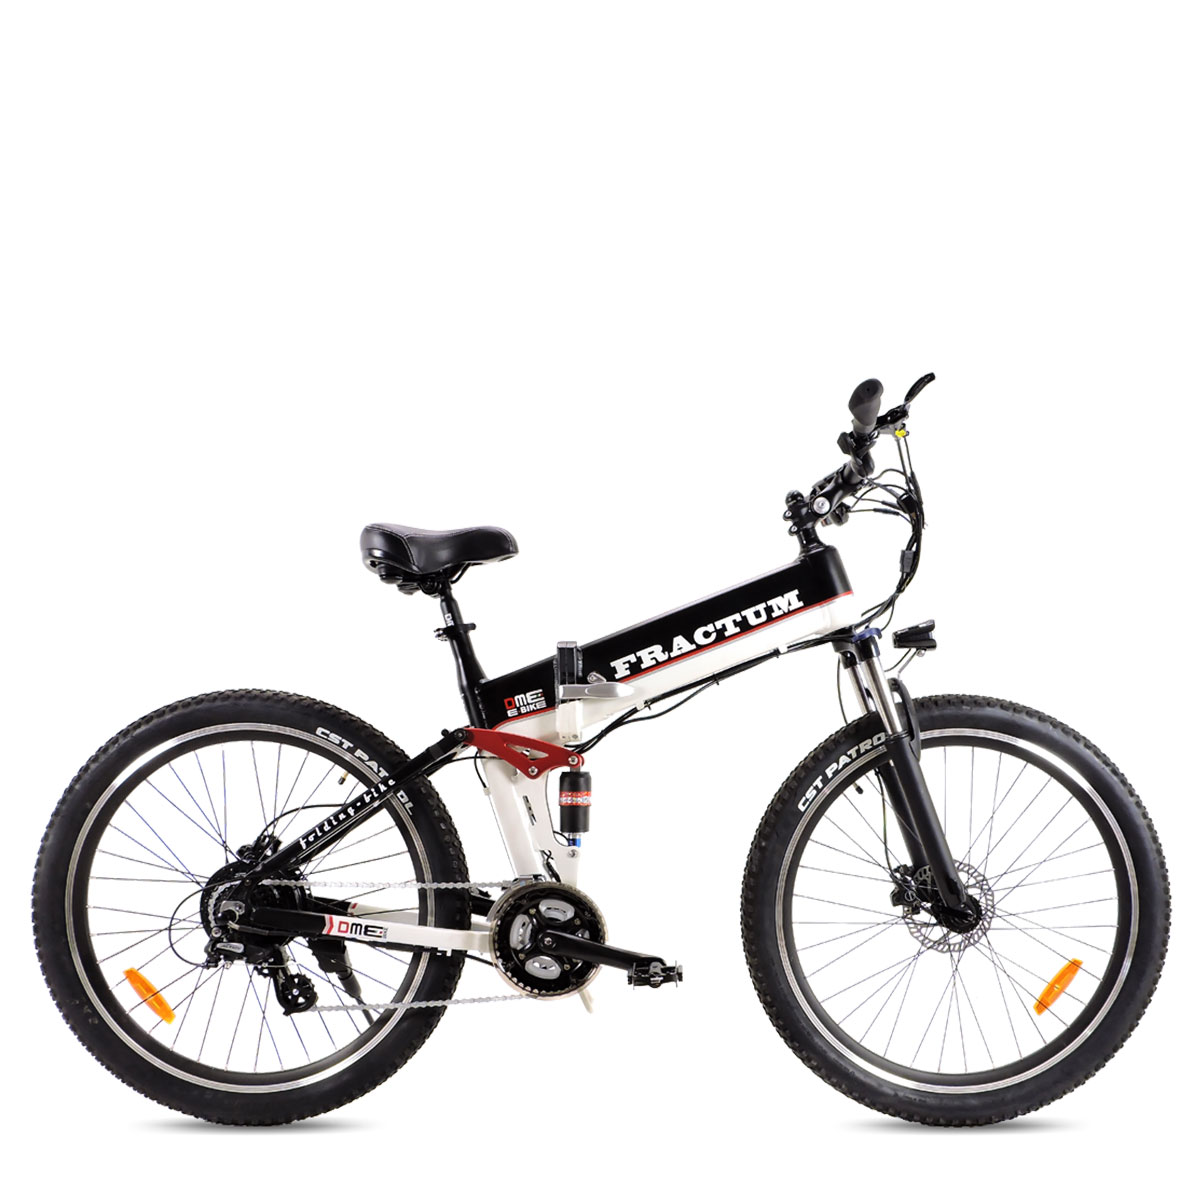 Bike Brake Identiti Mount Inserts